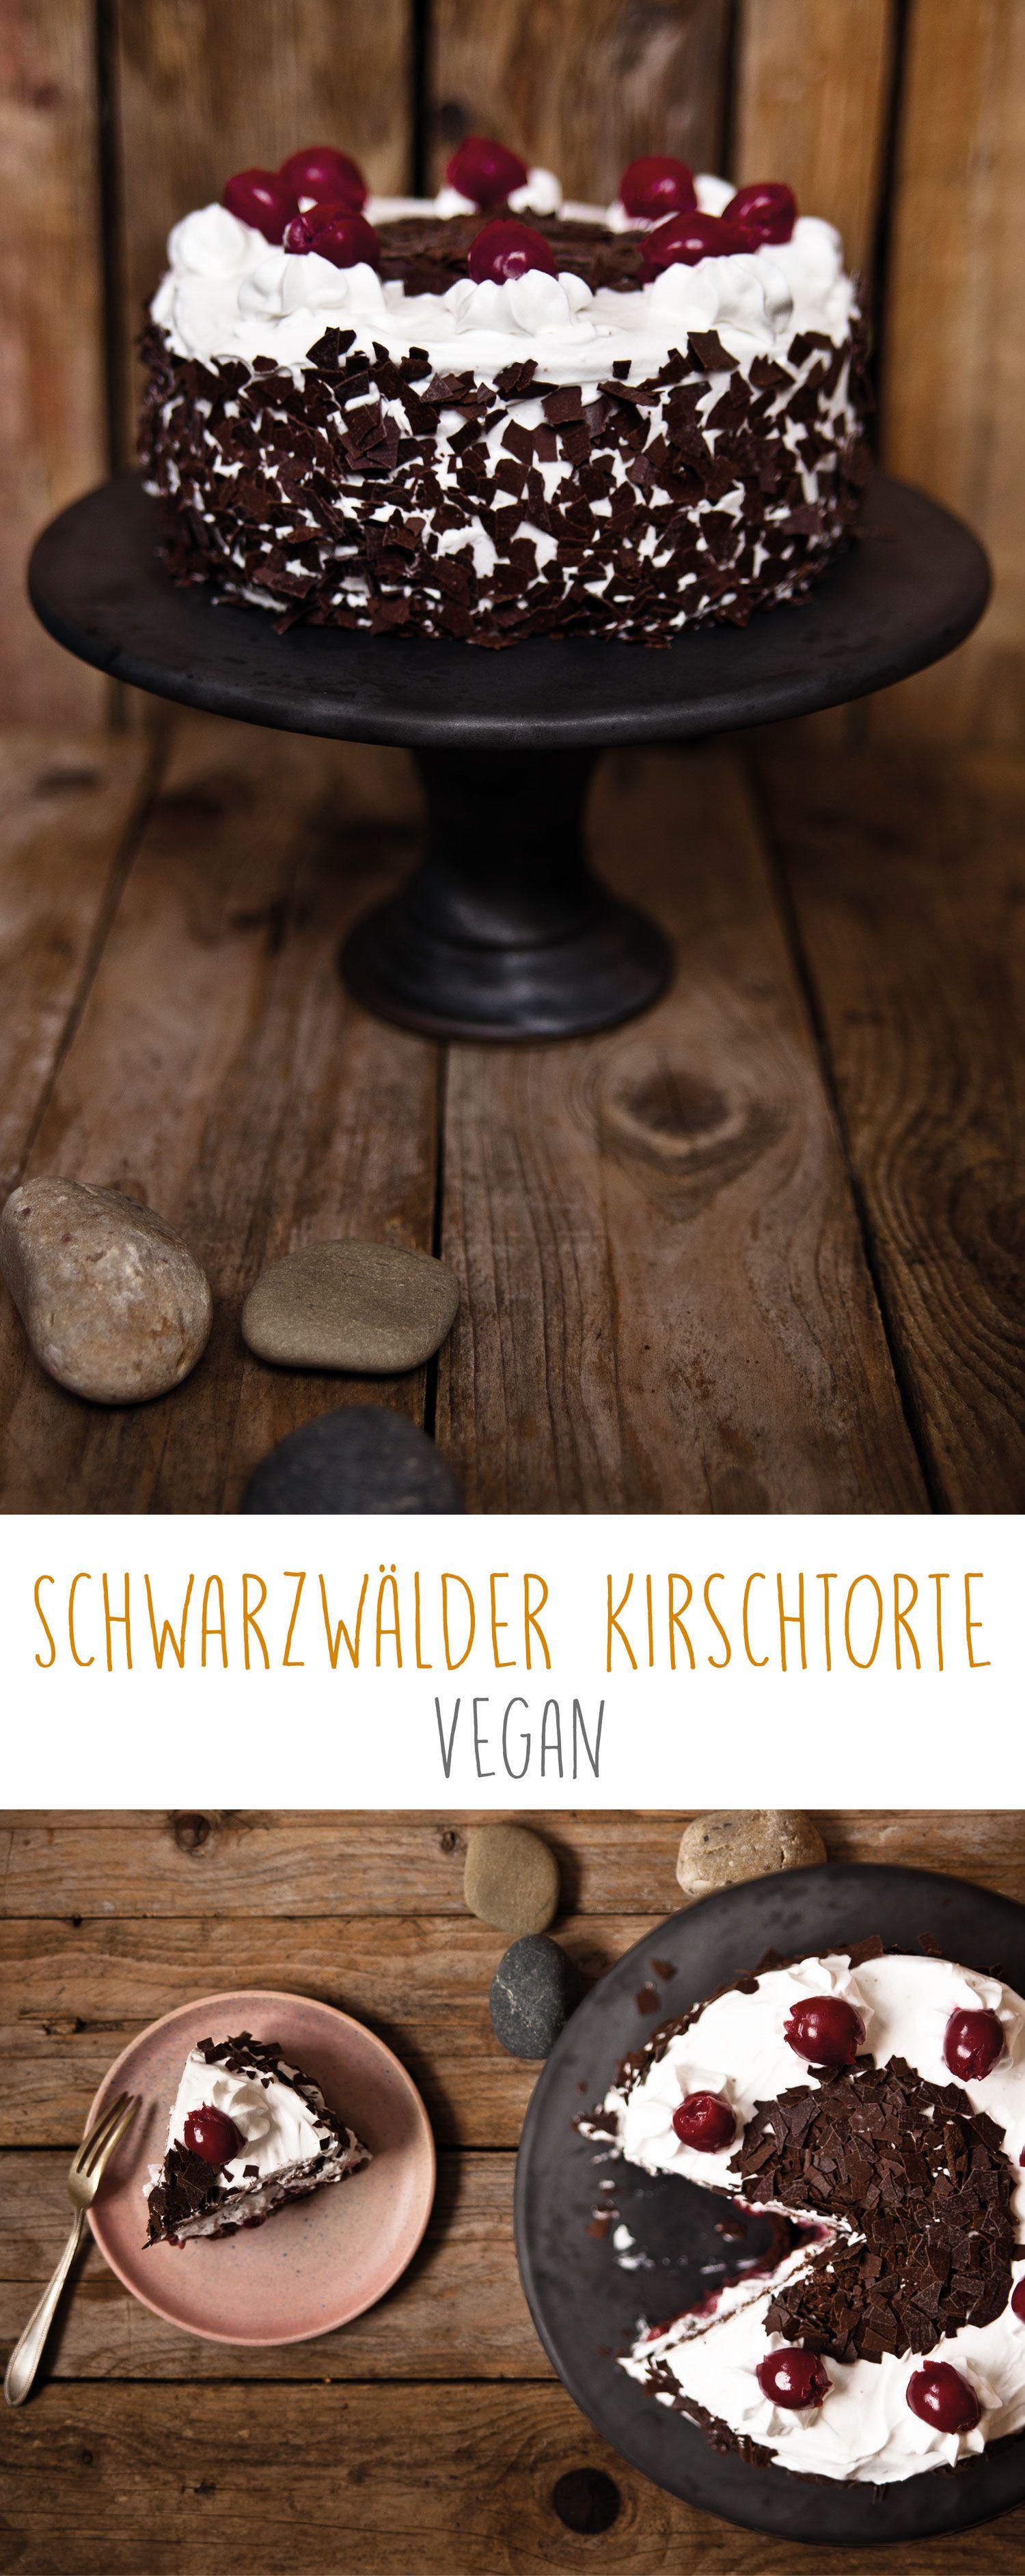 schwarzw lder kirschtorte vegan rezept backen vegan pinterest kirschtorte. Black Bedroom Furniture Sets. Home Design Ideas